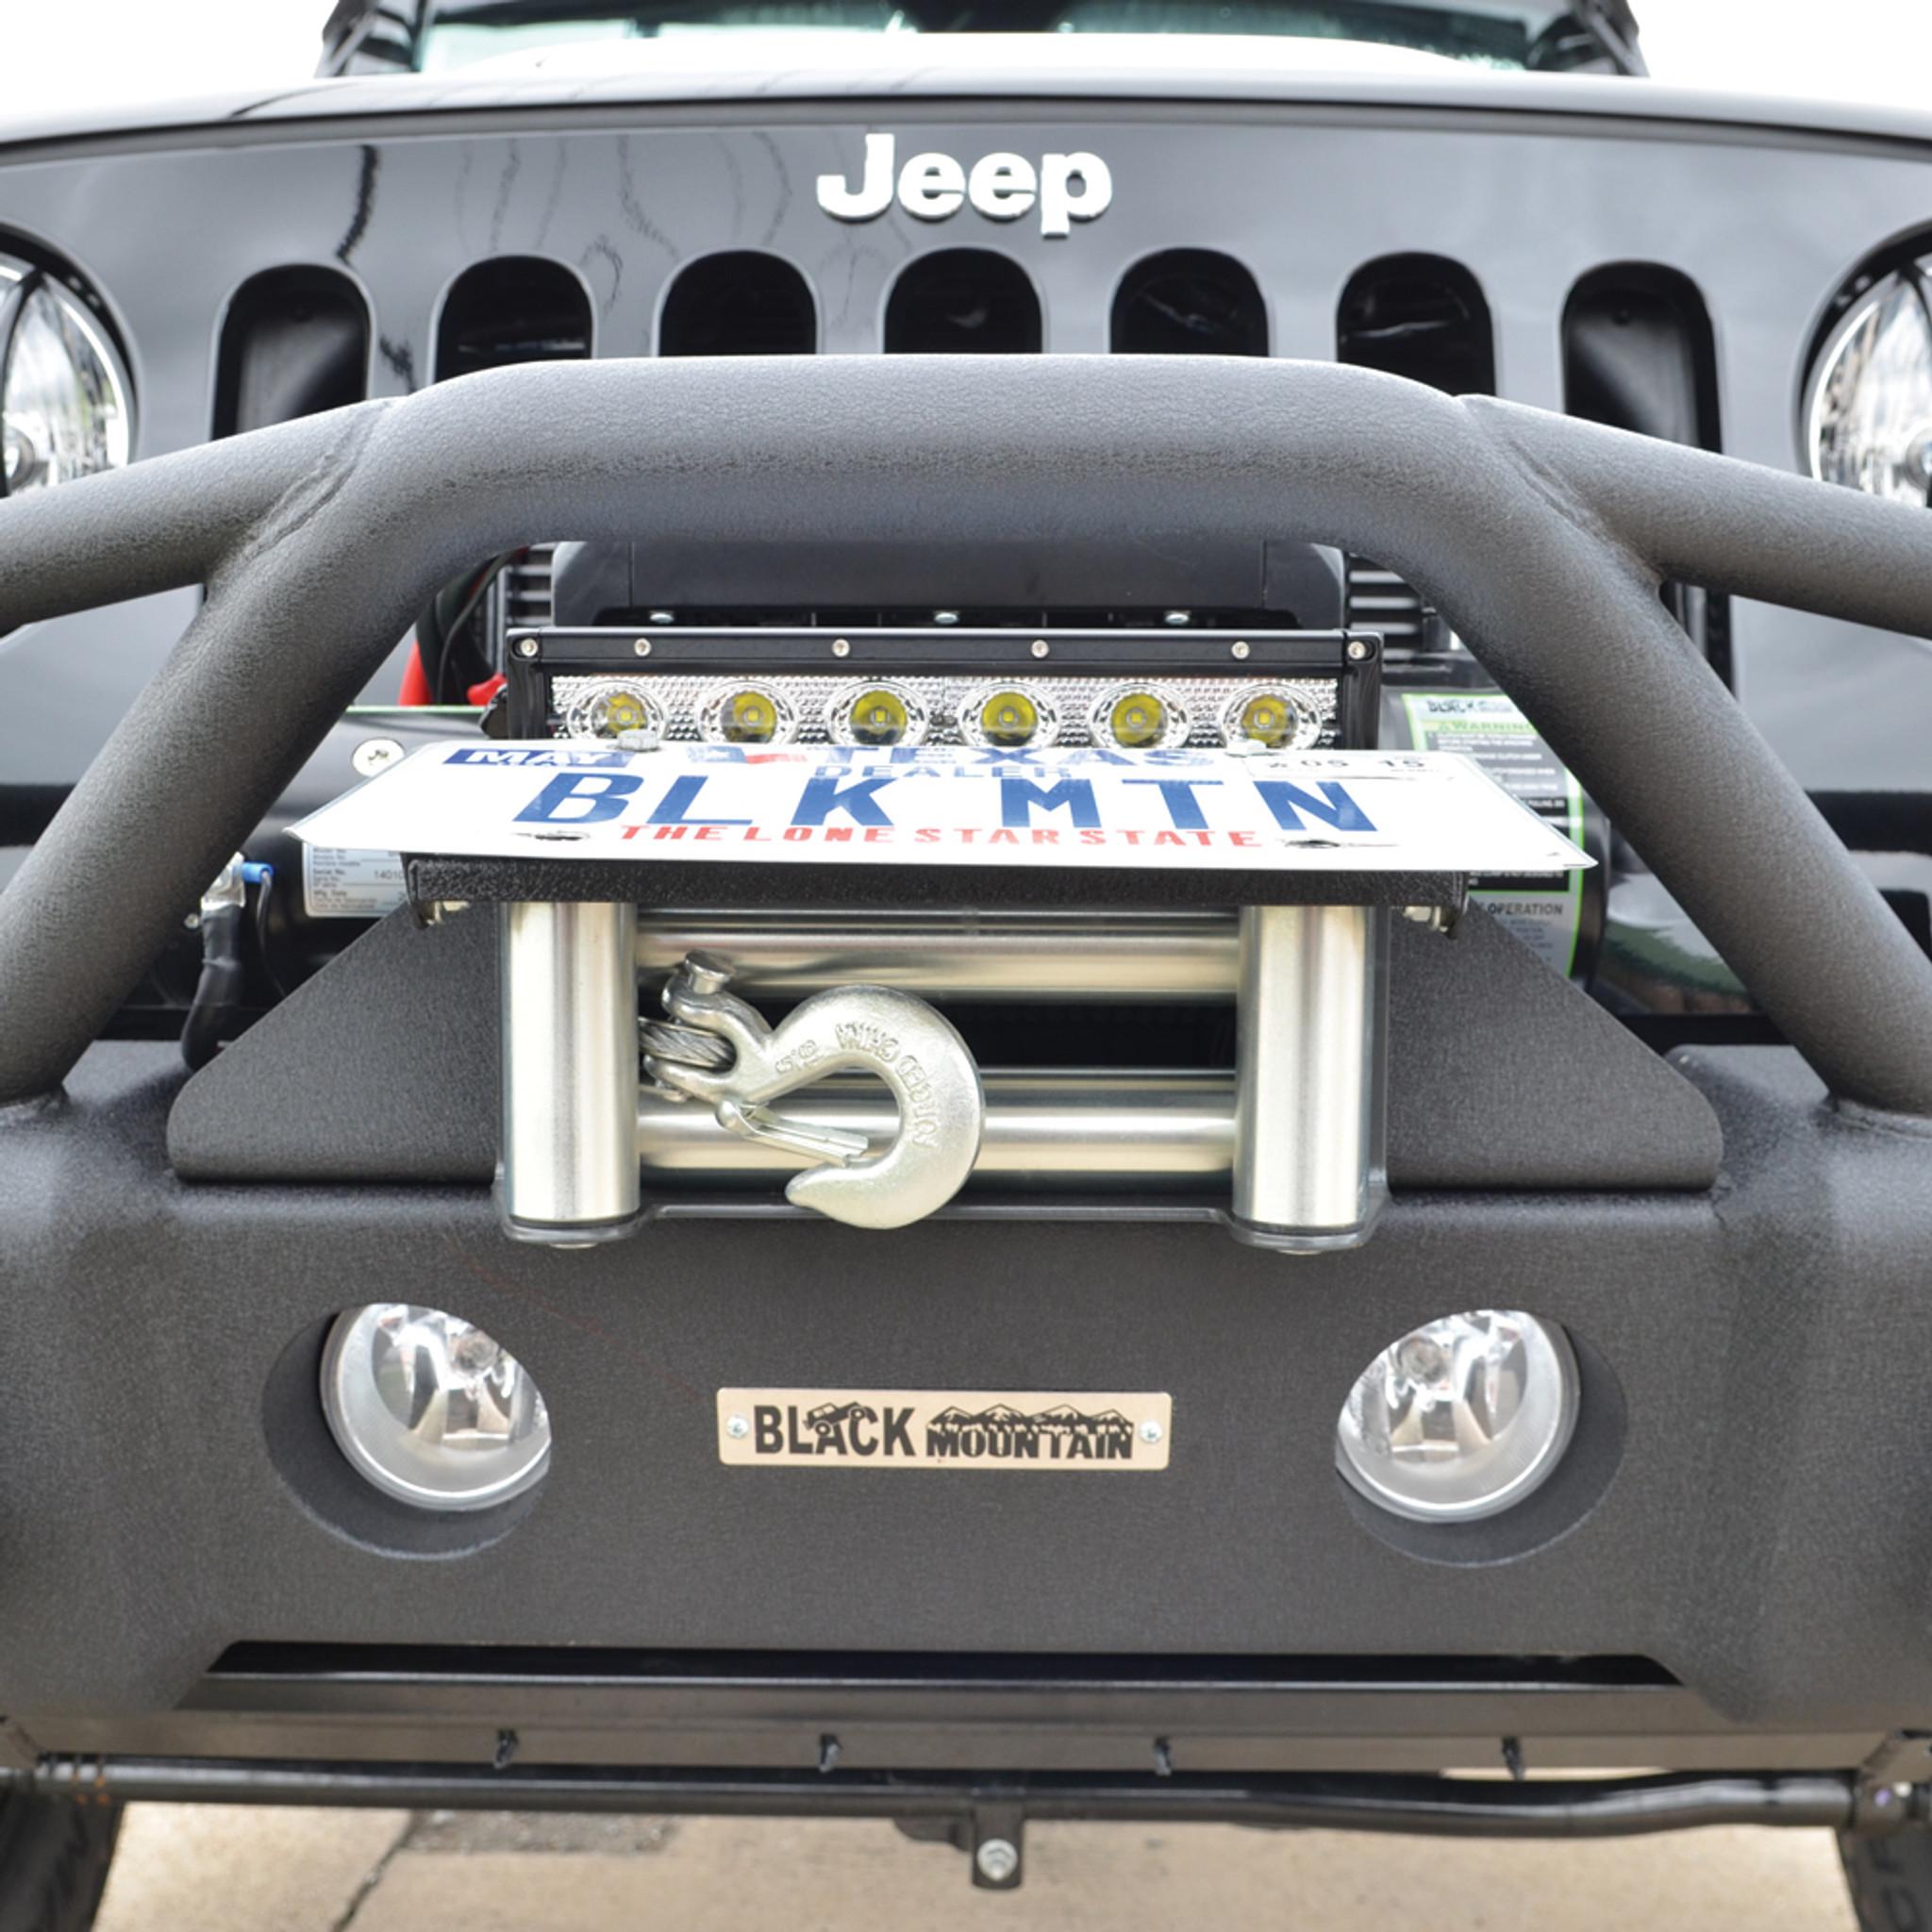 Black Mountain Jeep: Flip-Up License Plate Hinge